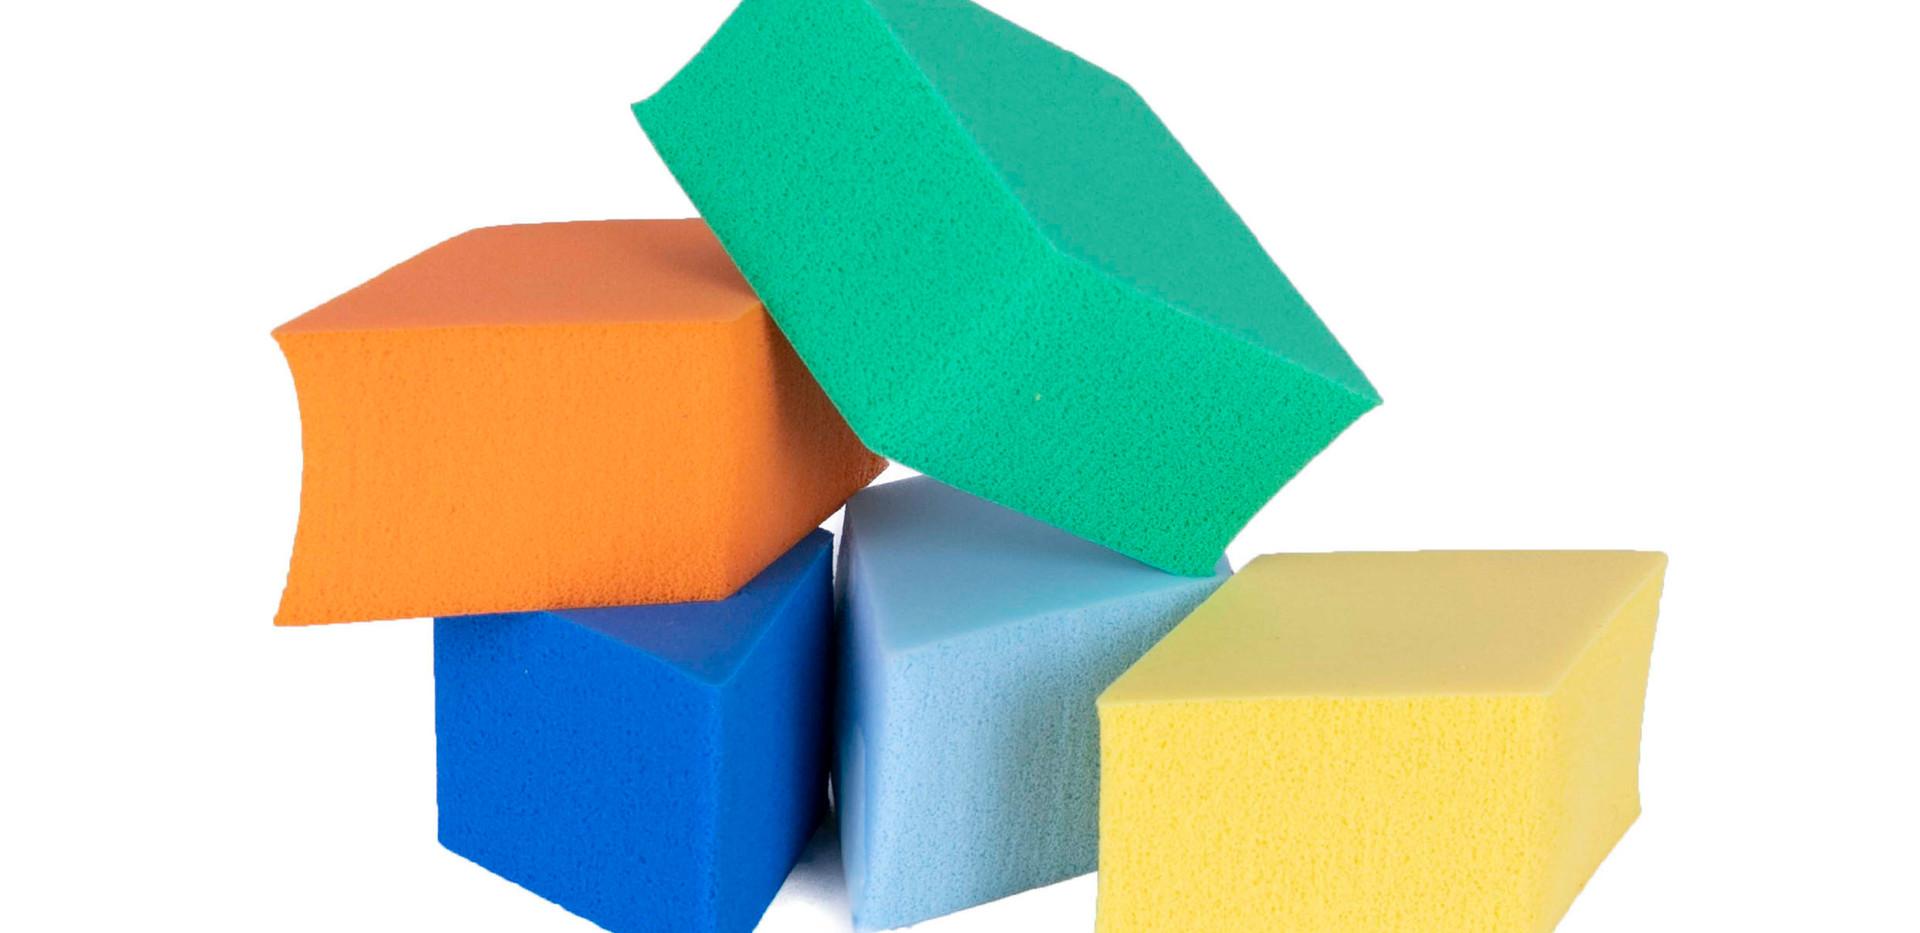 Kit de Esponjas com 5 Peças Dapop - HB97441